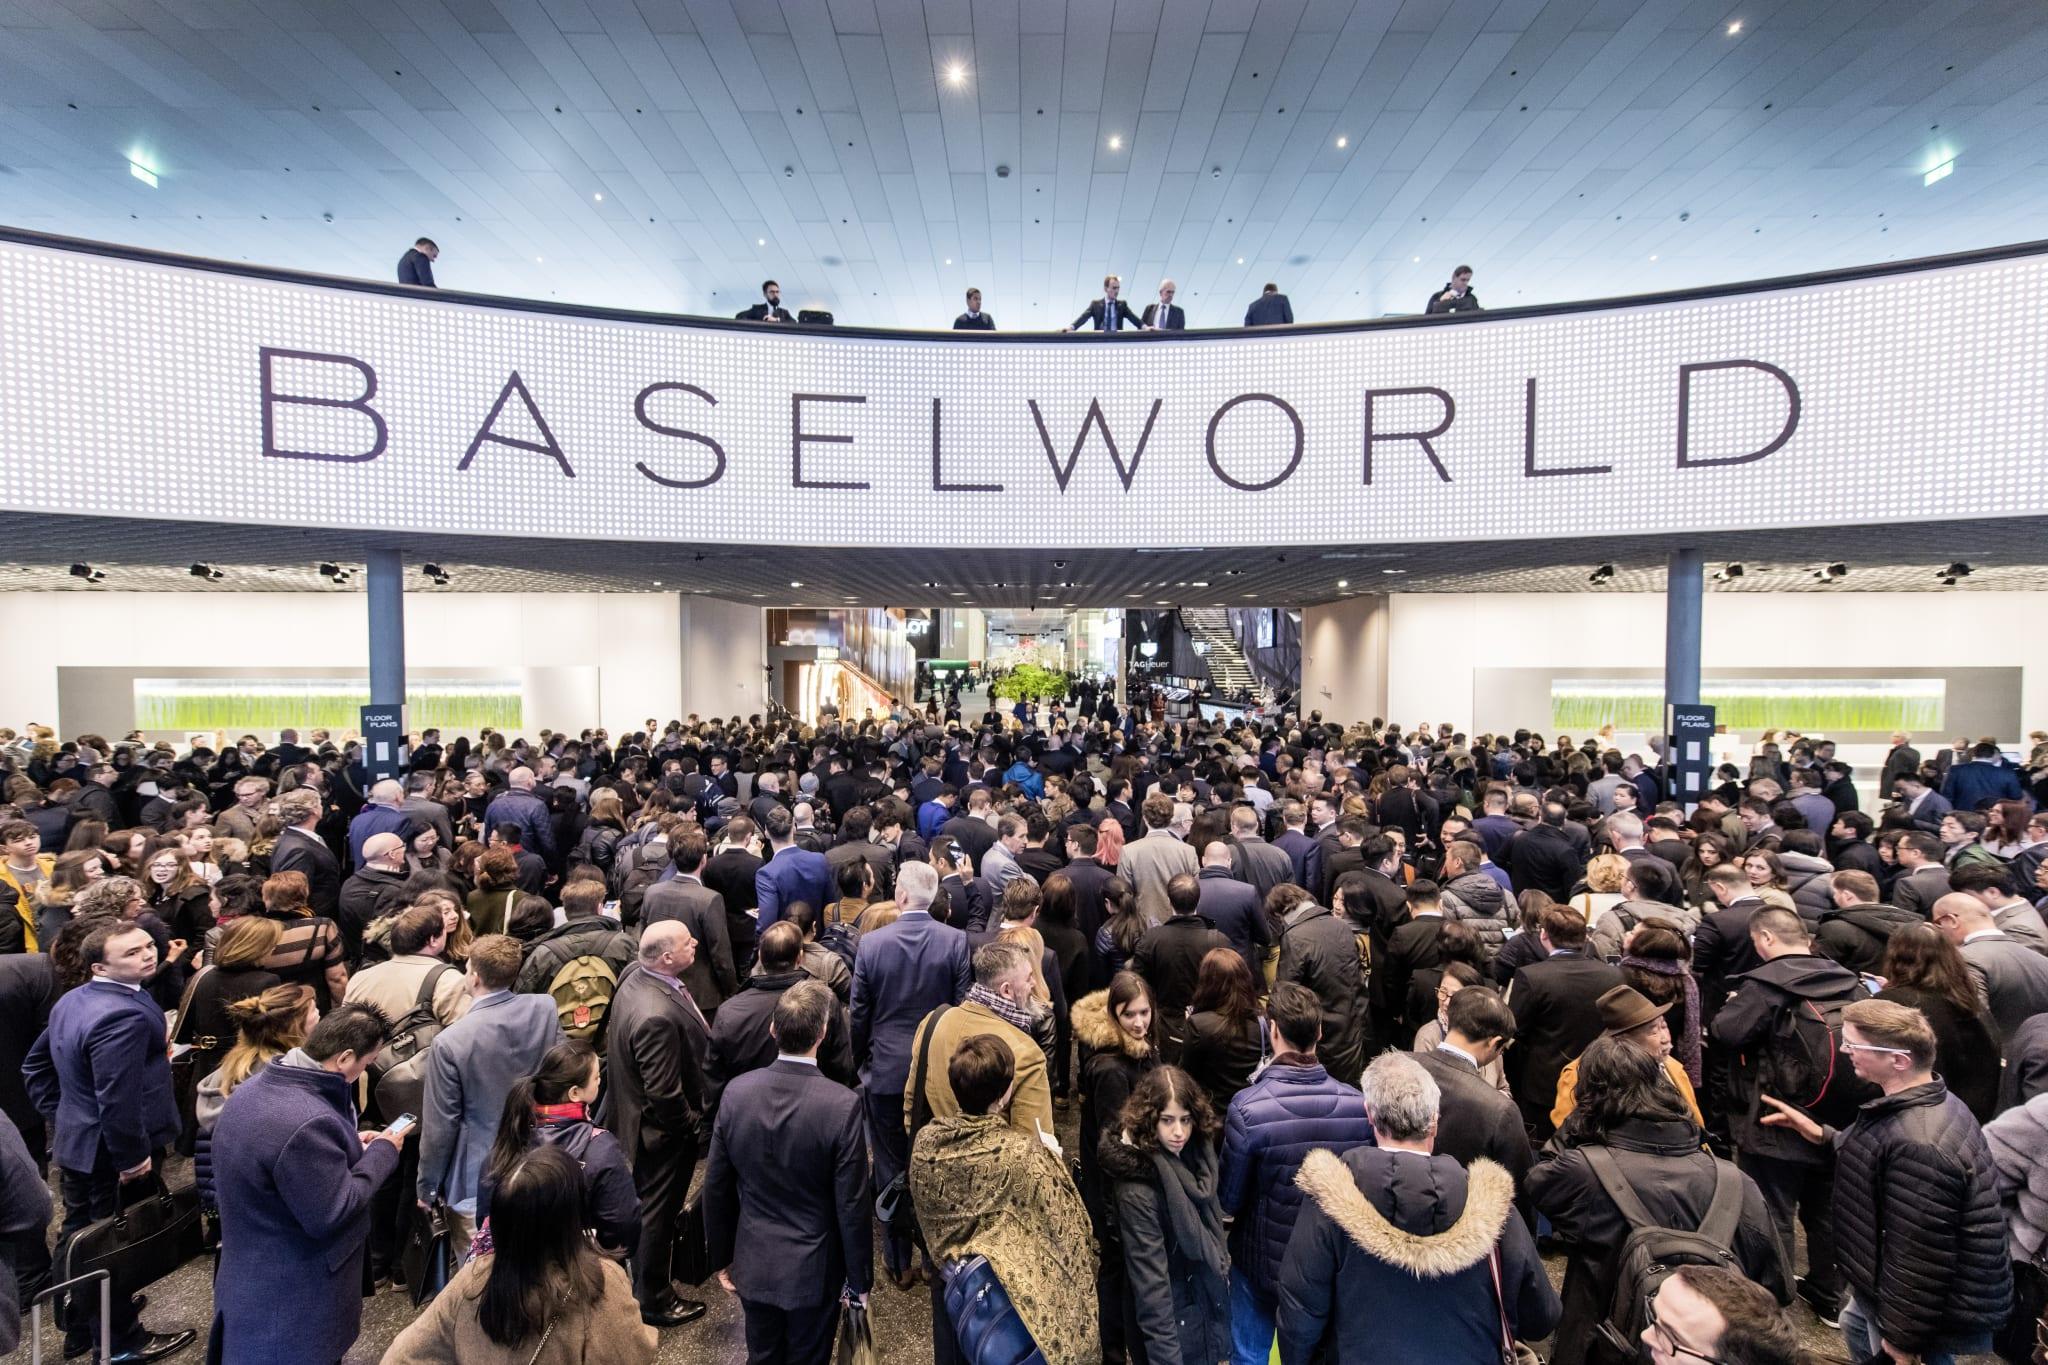 Baselworld crowd